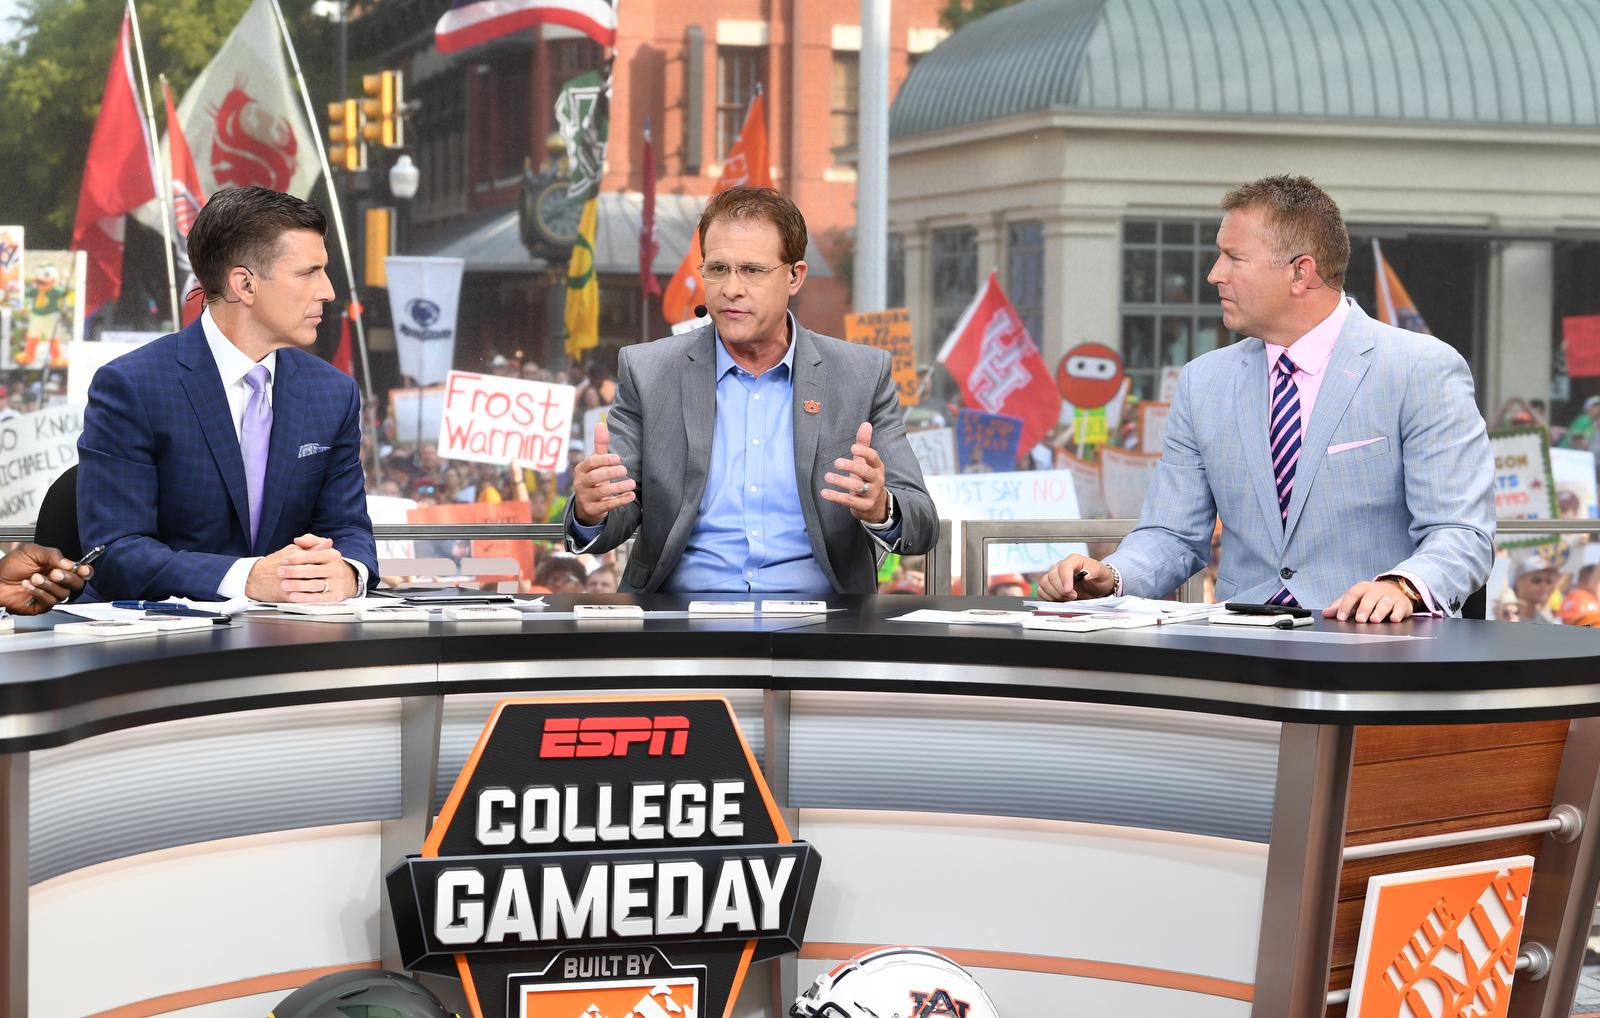 NCS_ESPN-College-Gameday_0005